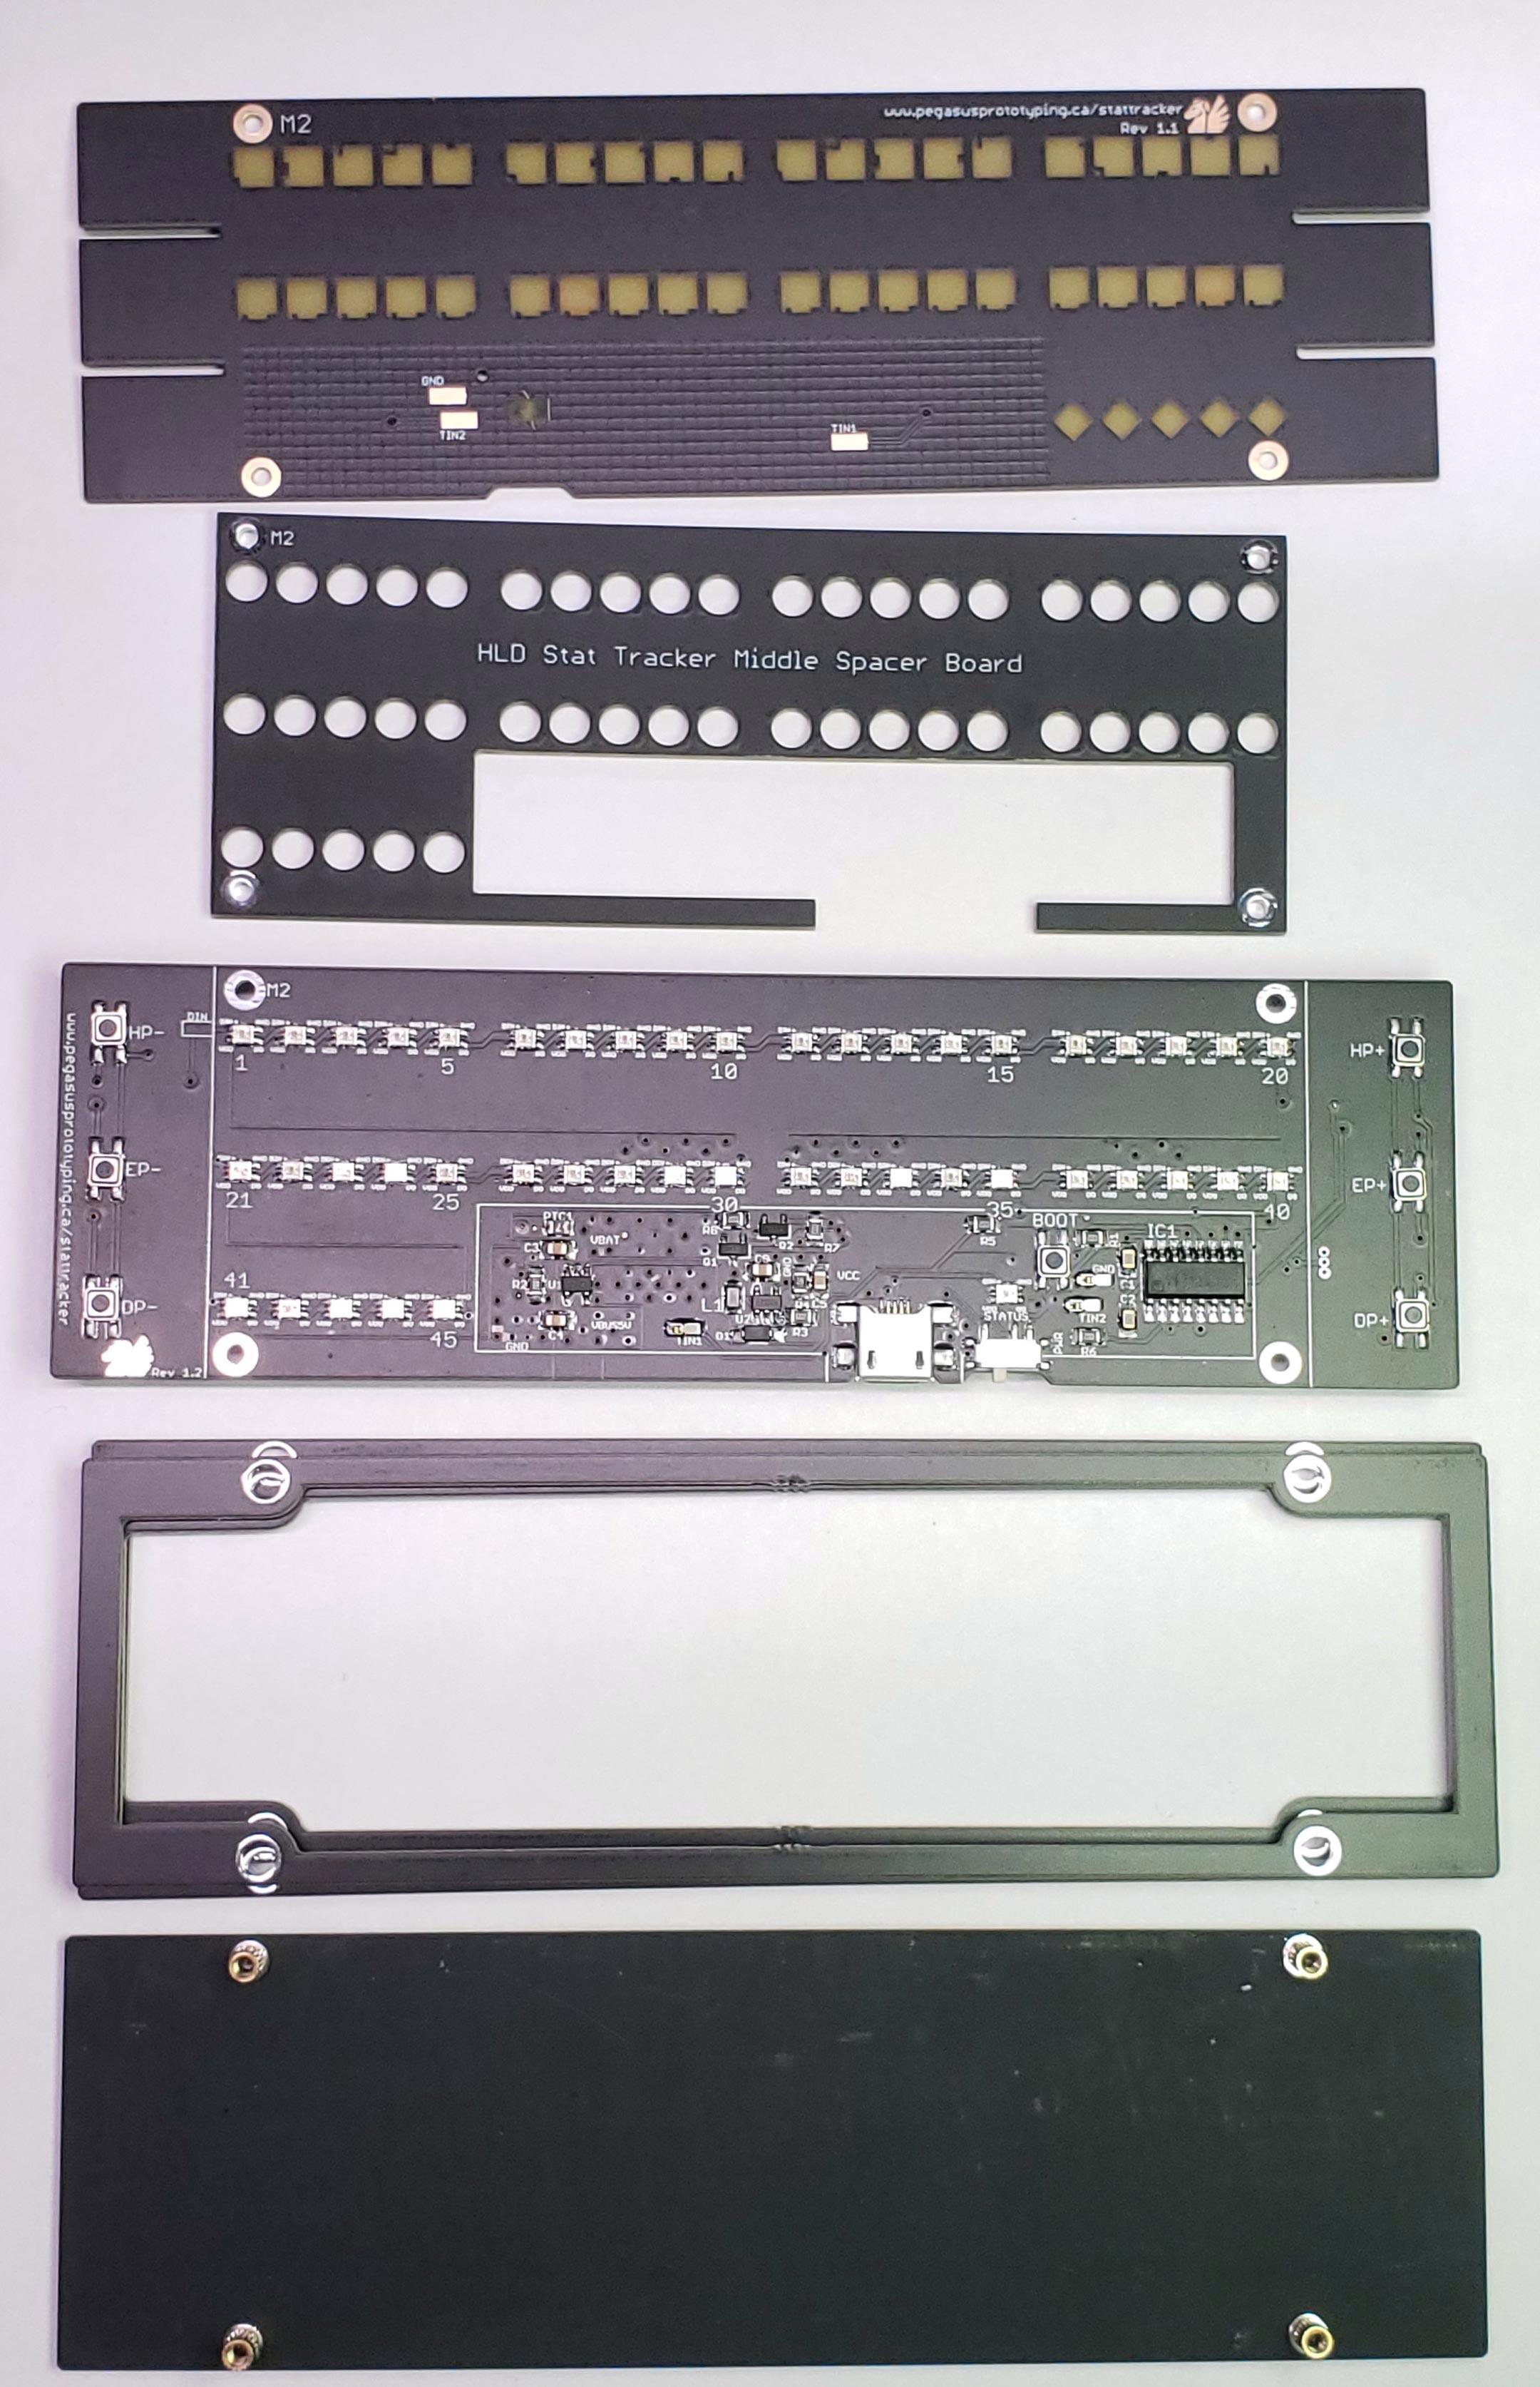 The PCB stackup